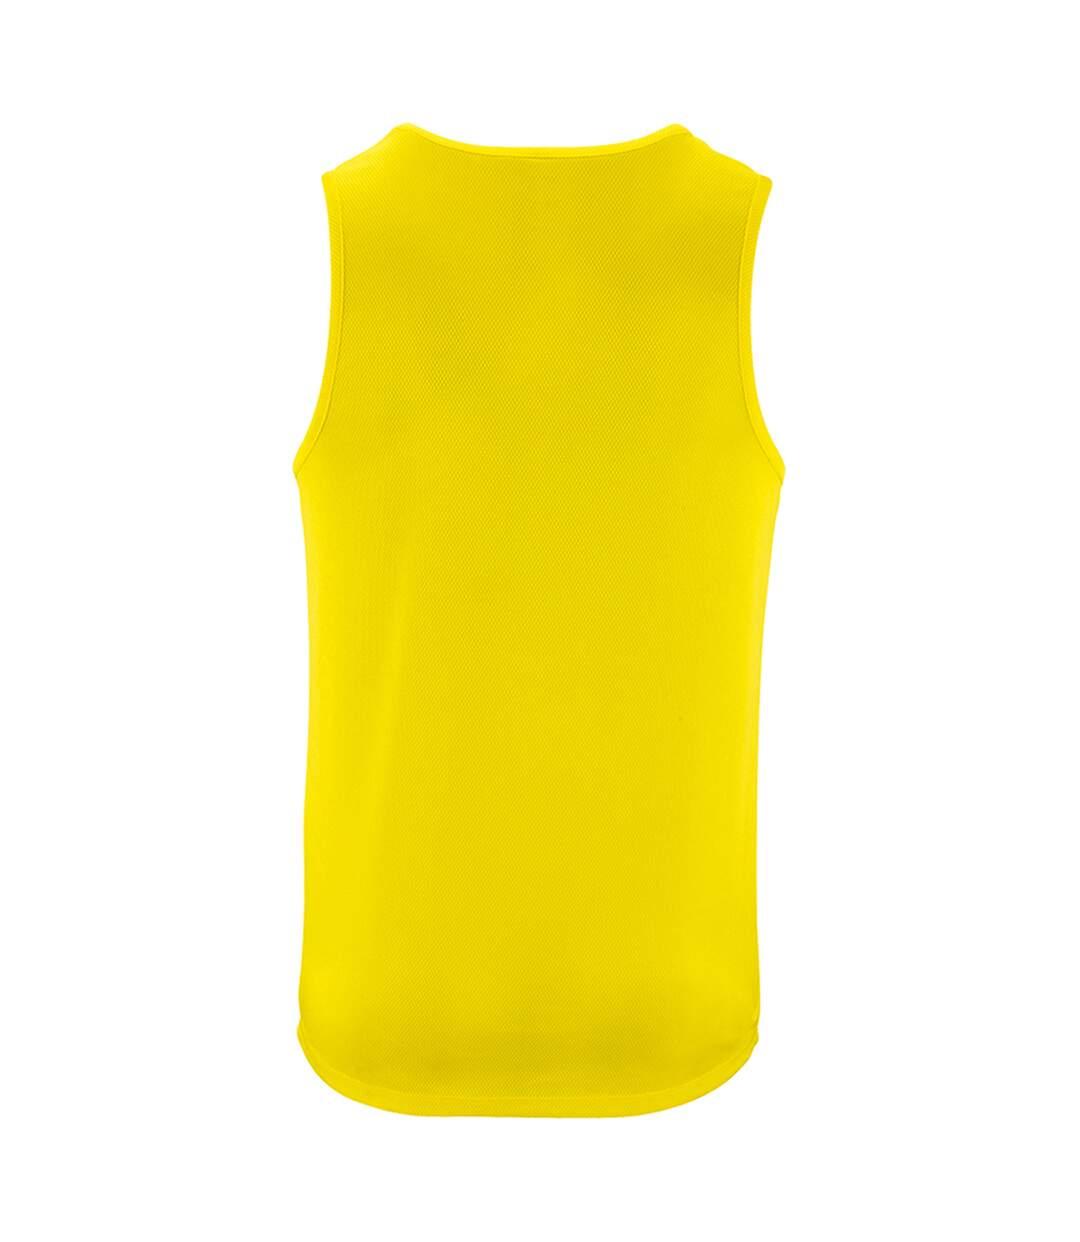 SOLS Mens Sporty Performance Tank Top (Neon Yellow) - UTPC2904